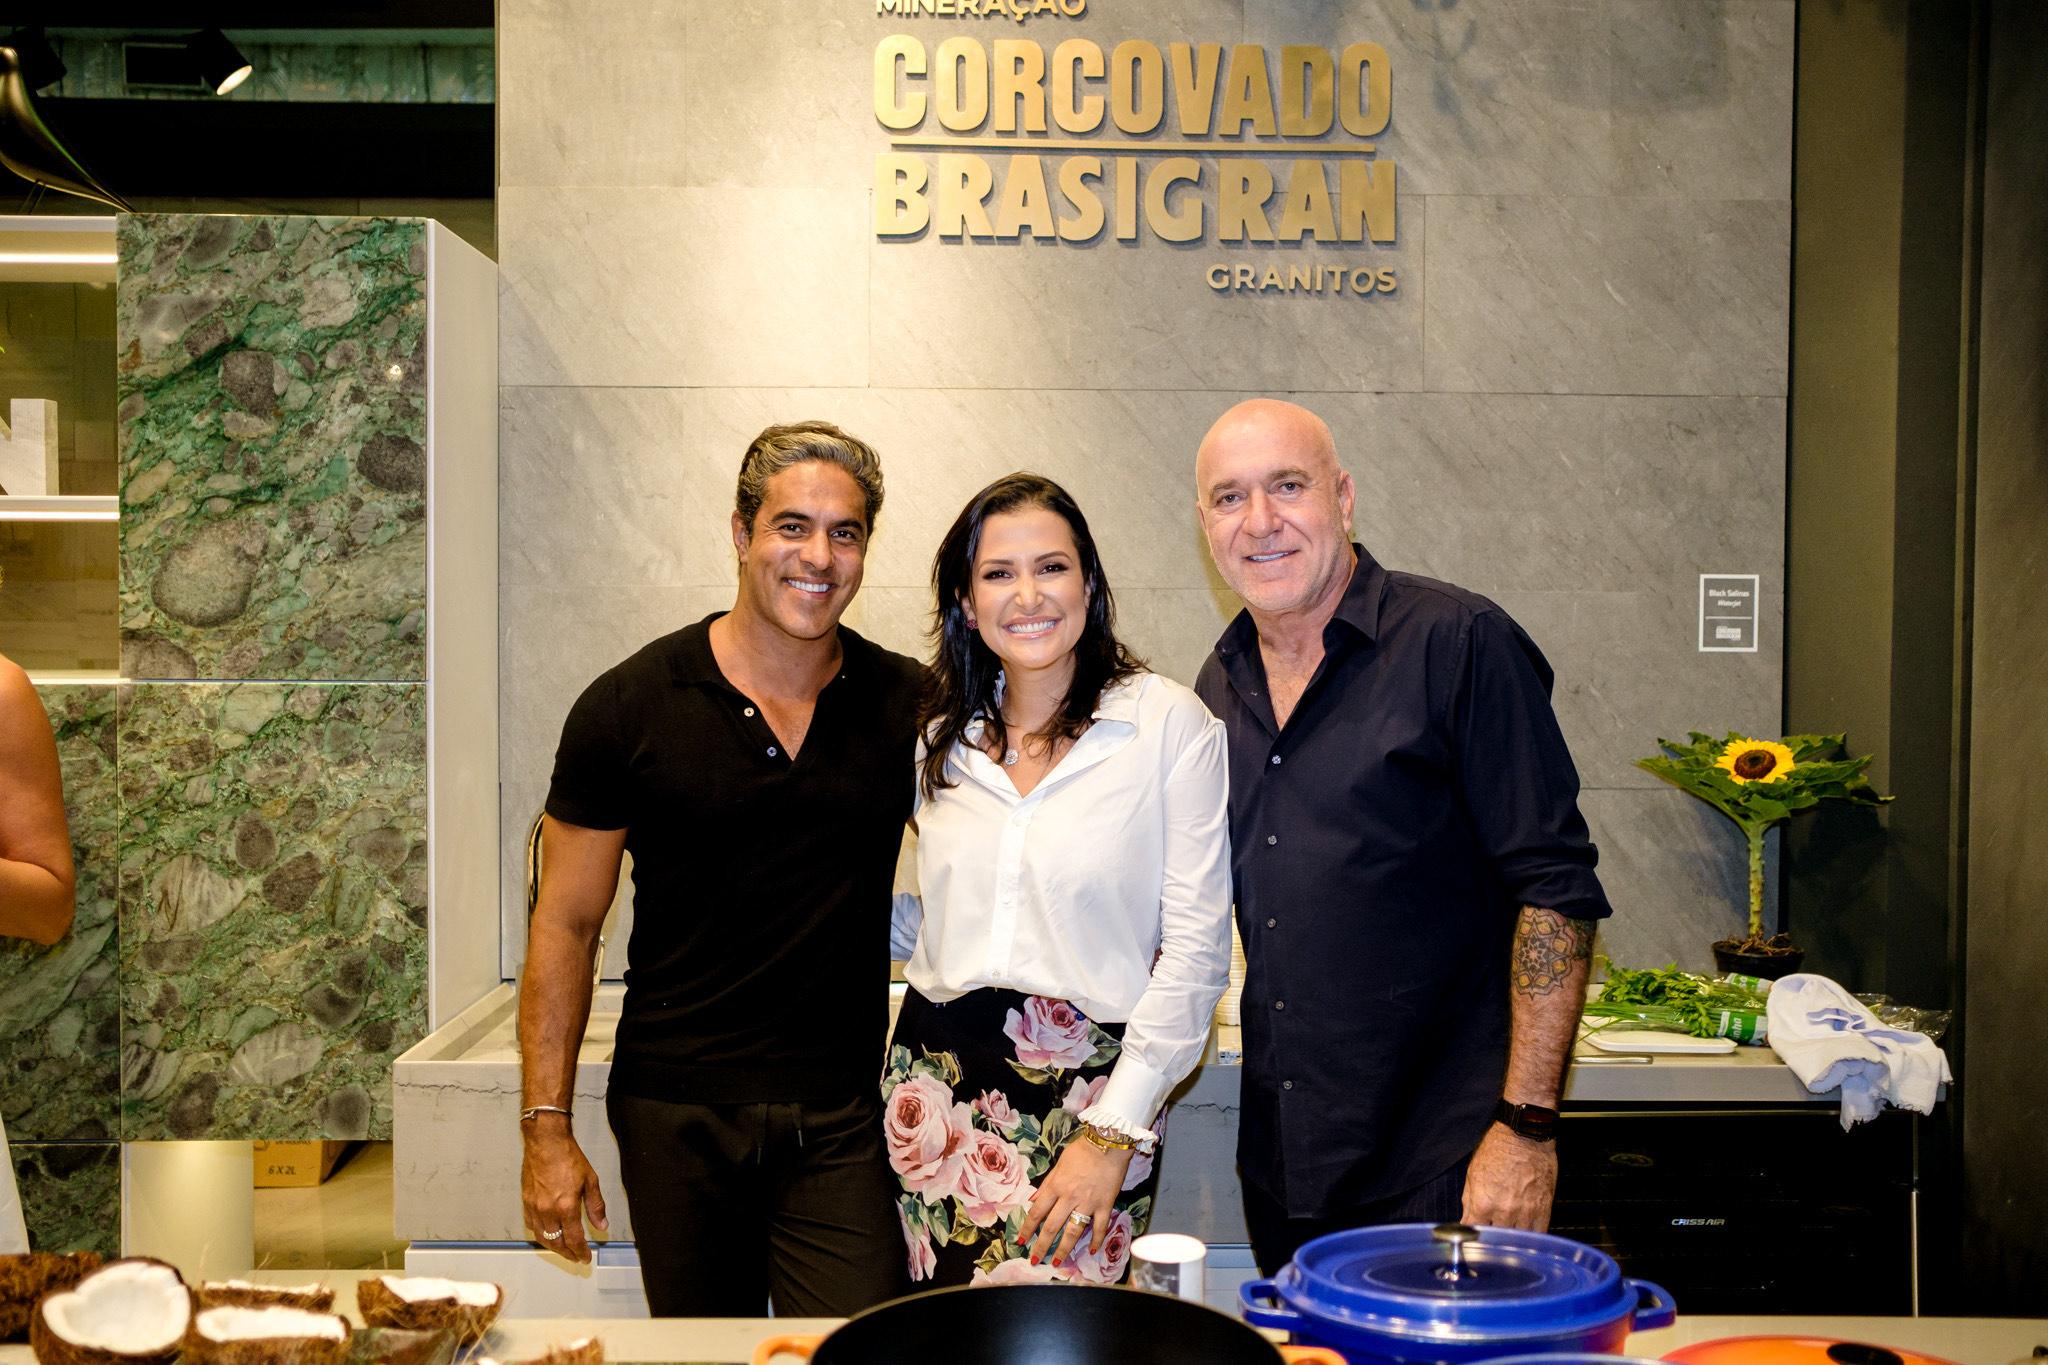 Cooking show: Kiko Sobrino, Vívian Coser e Gilberto Elkis no estande da Brasigran na Vitória Stone Fair 2020. Foto: Camilla Baptistin